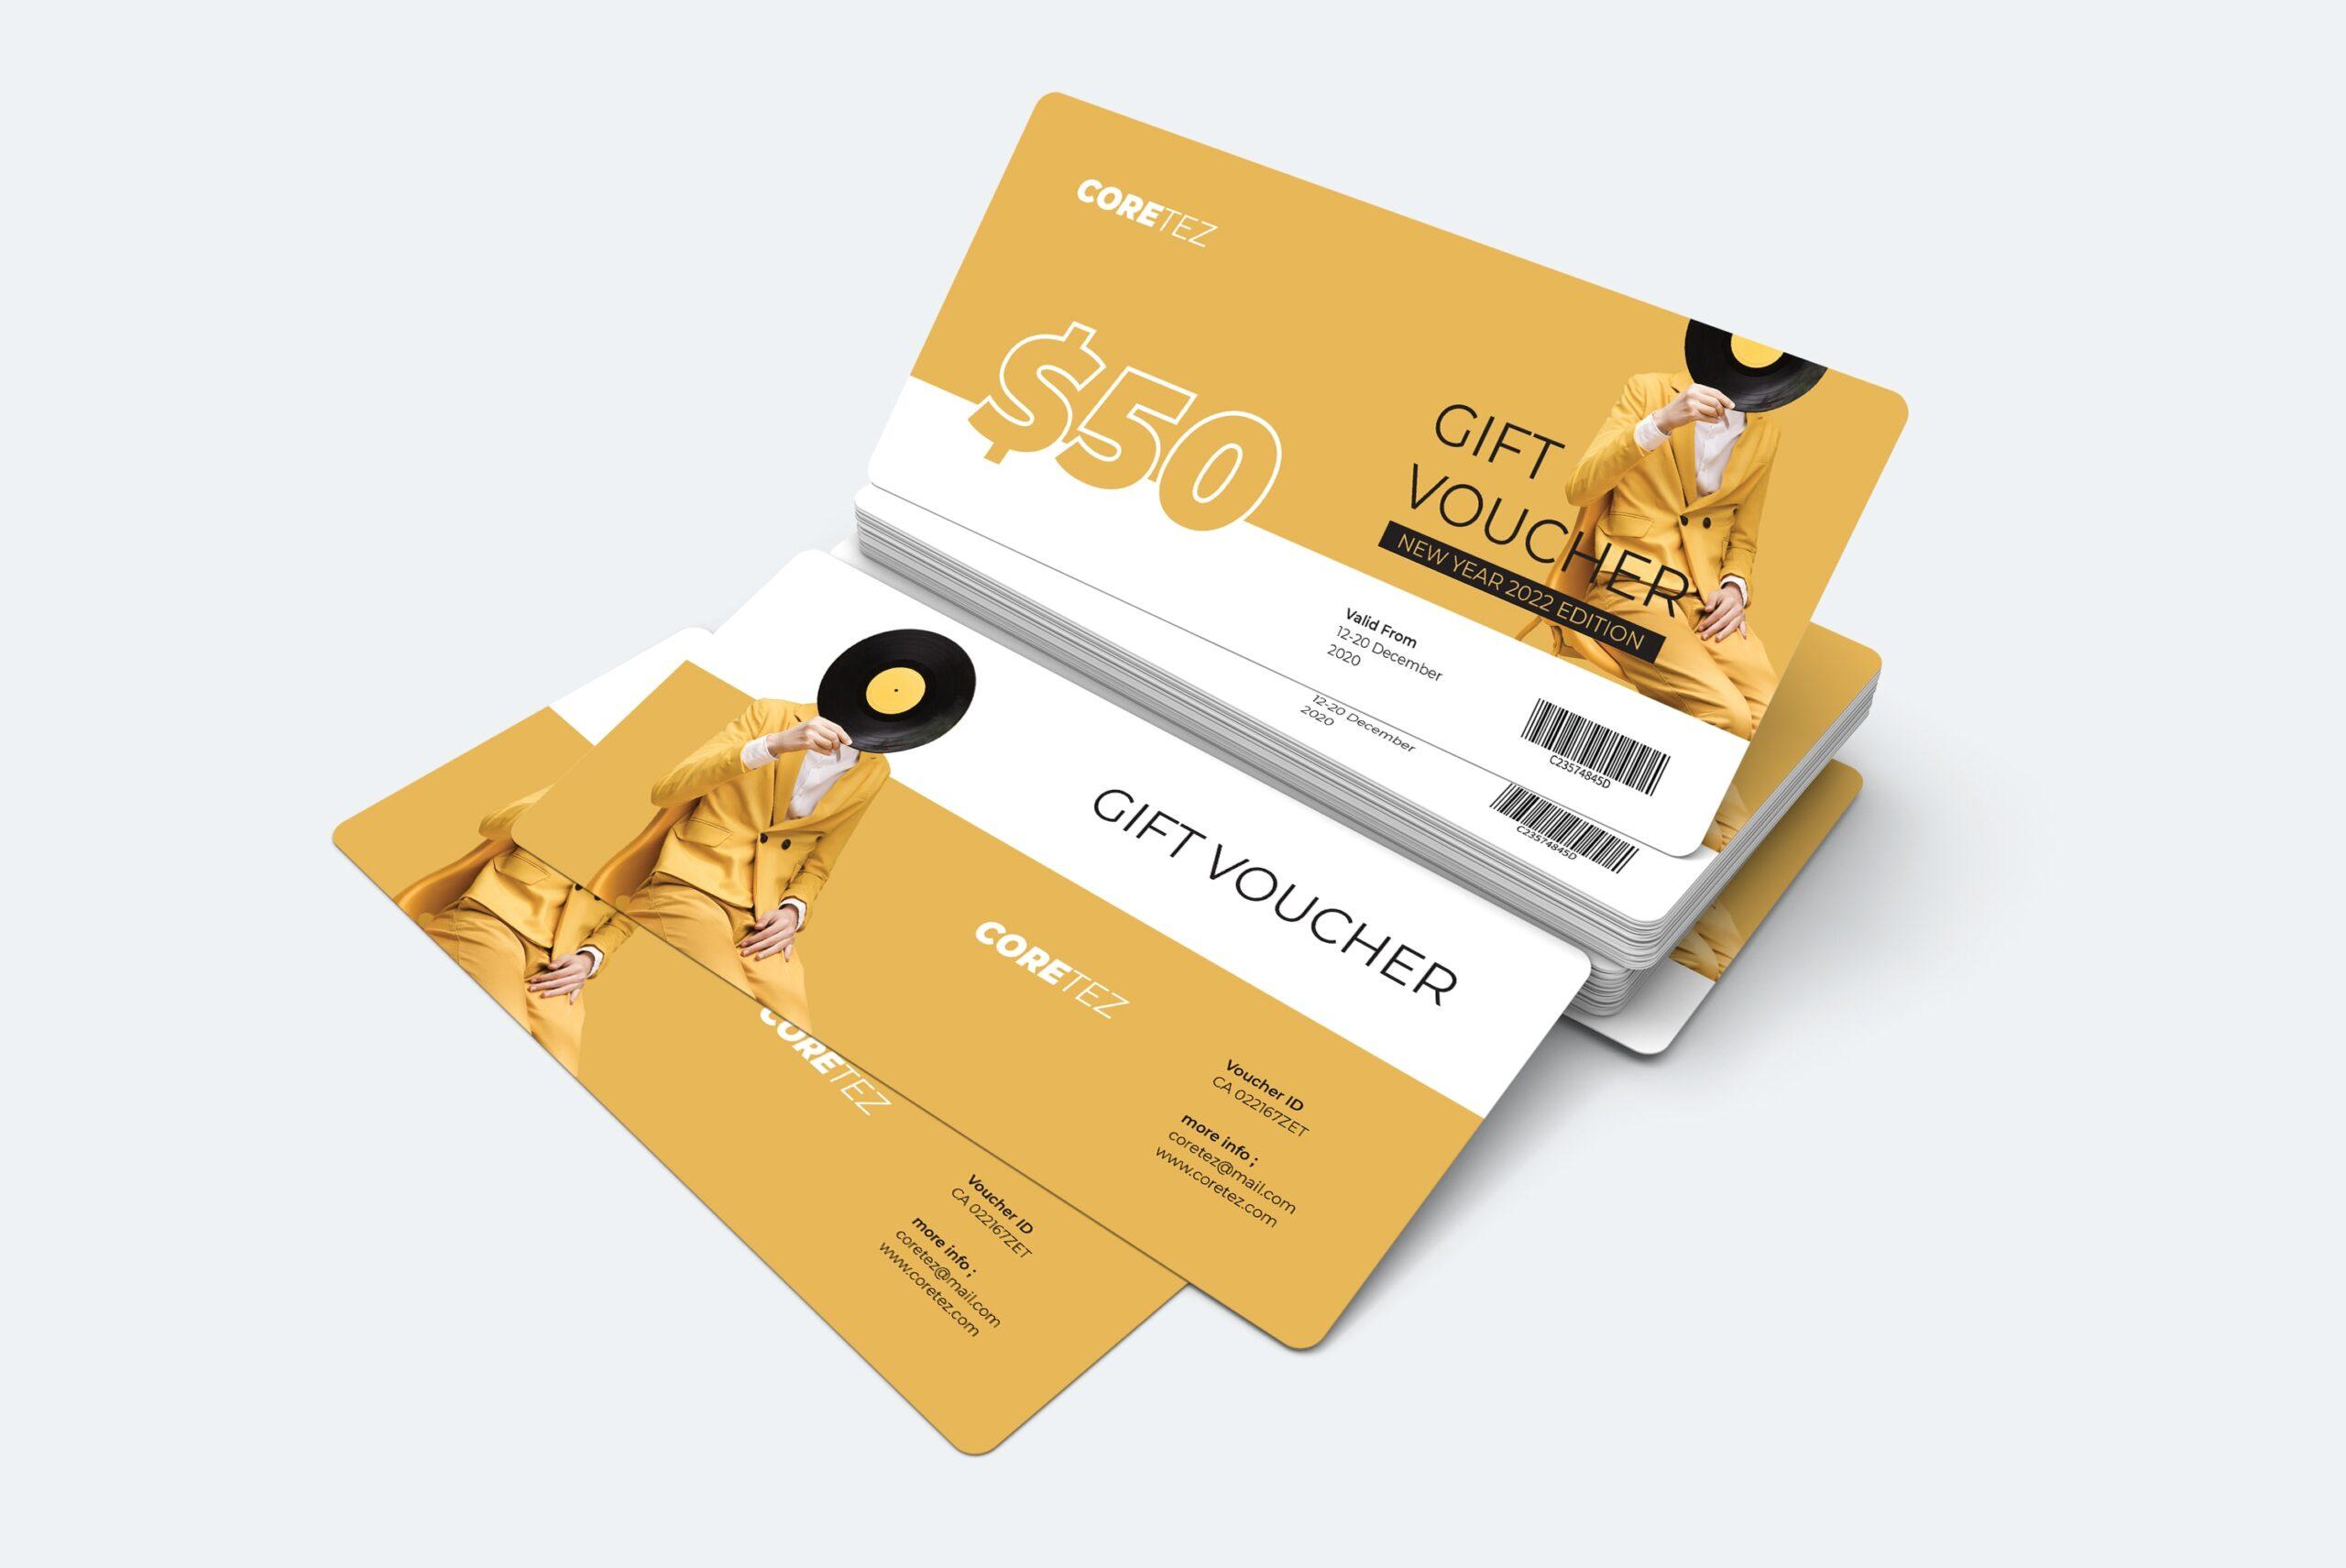 Gift Card Voucher - New Year Fashion